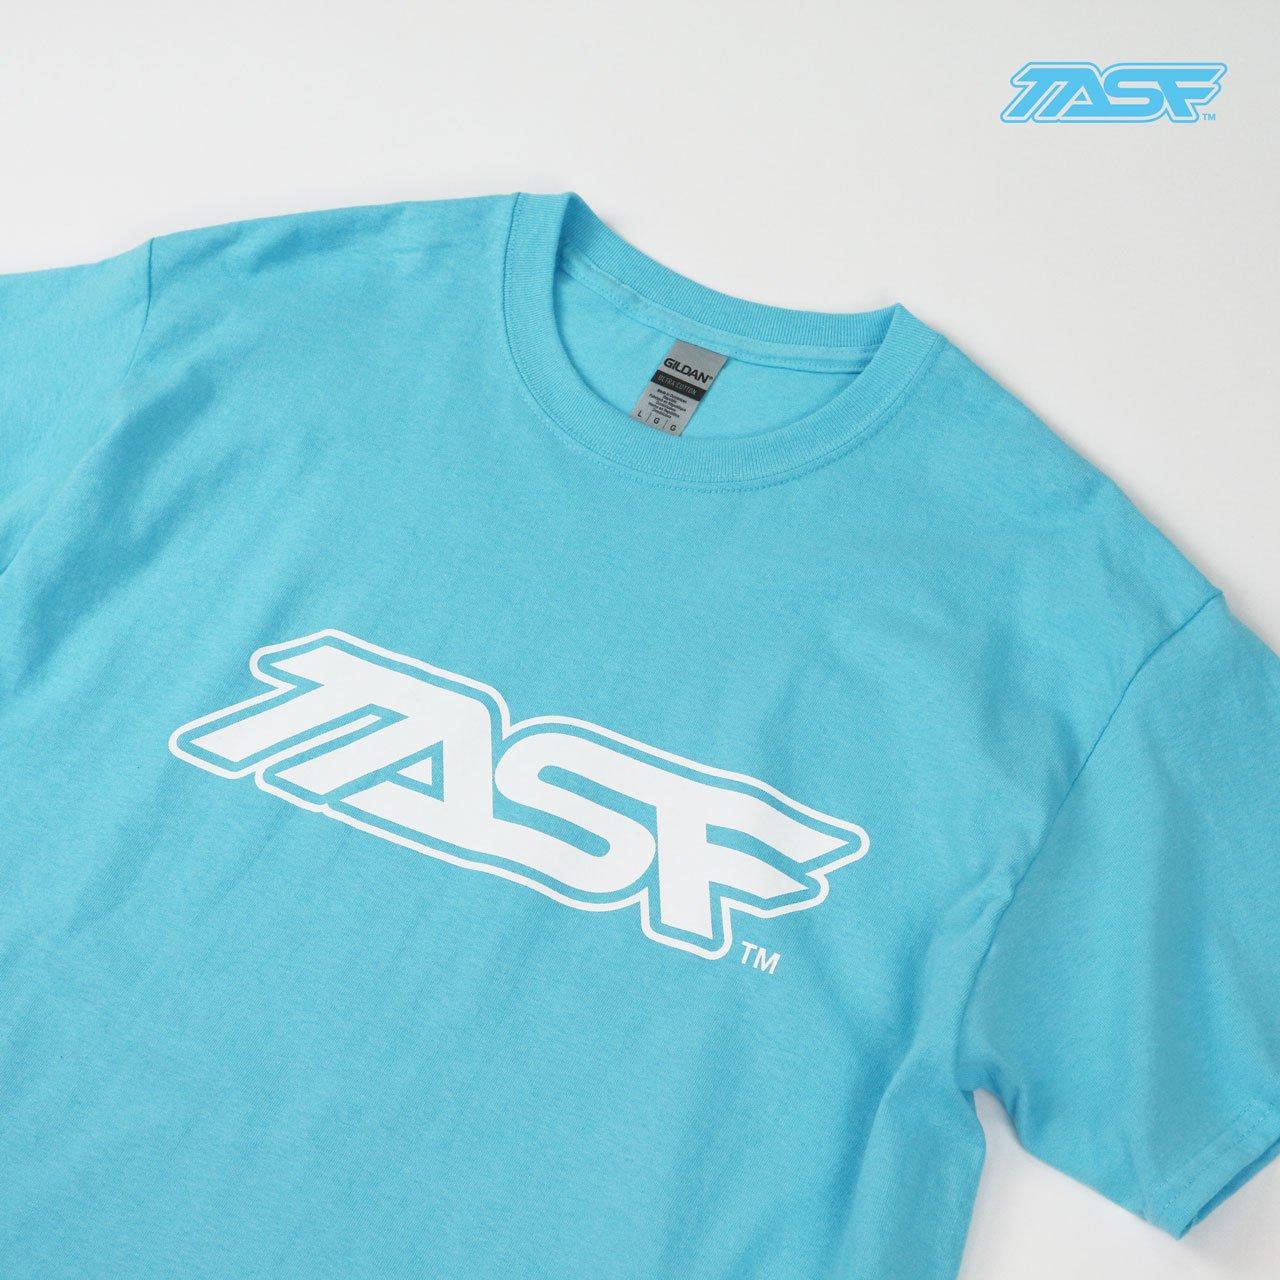 TASF Logo Tee -T.Blue-